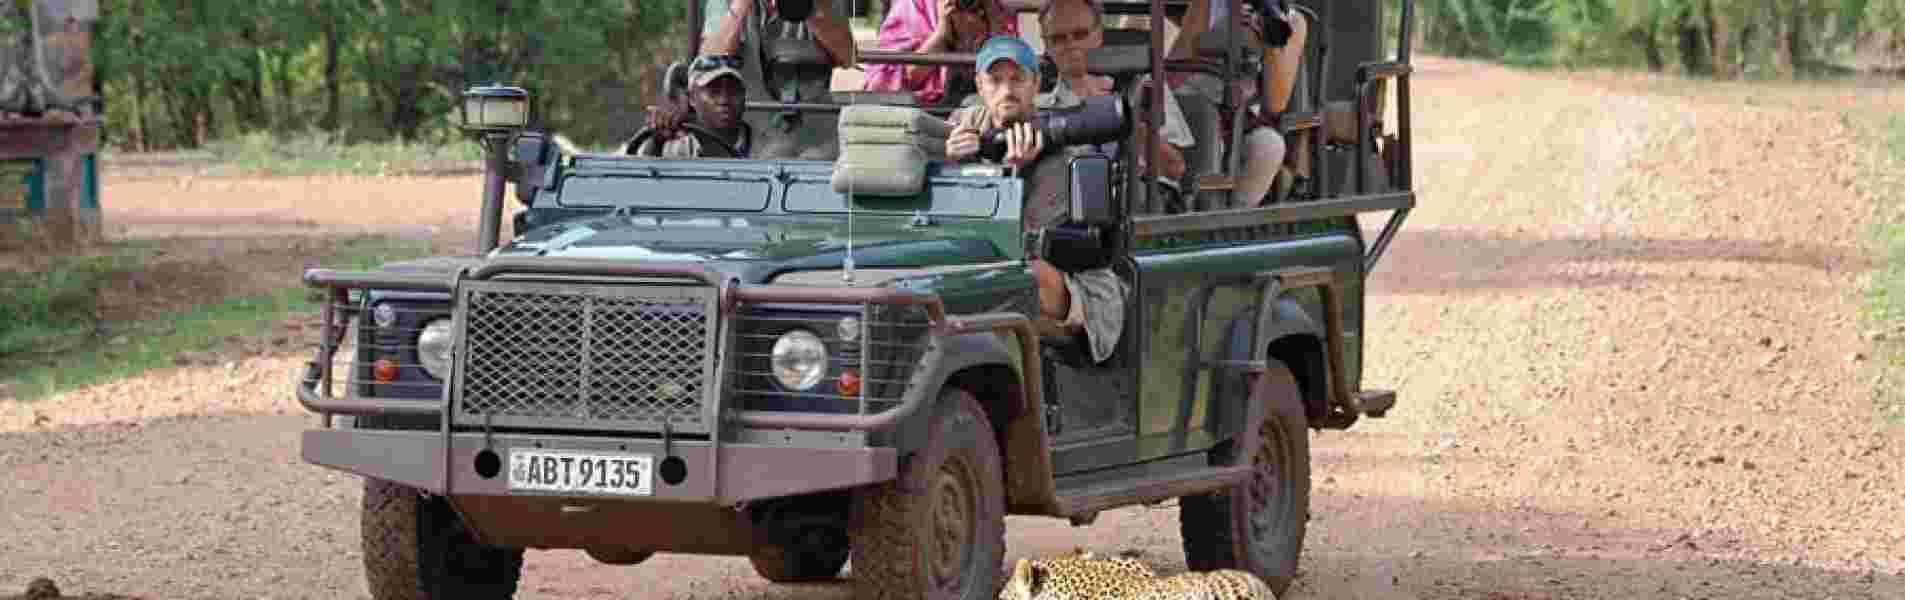 ZAMBIA A MUST VISIT AFRICAN SAFARI DESTINATION header image